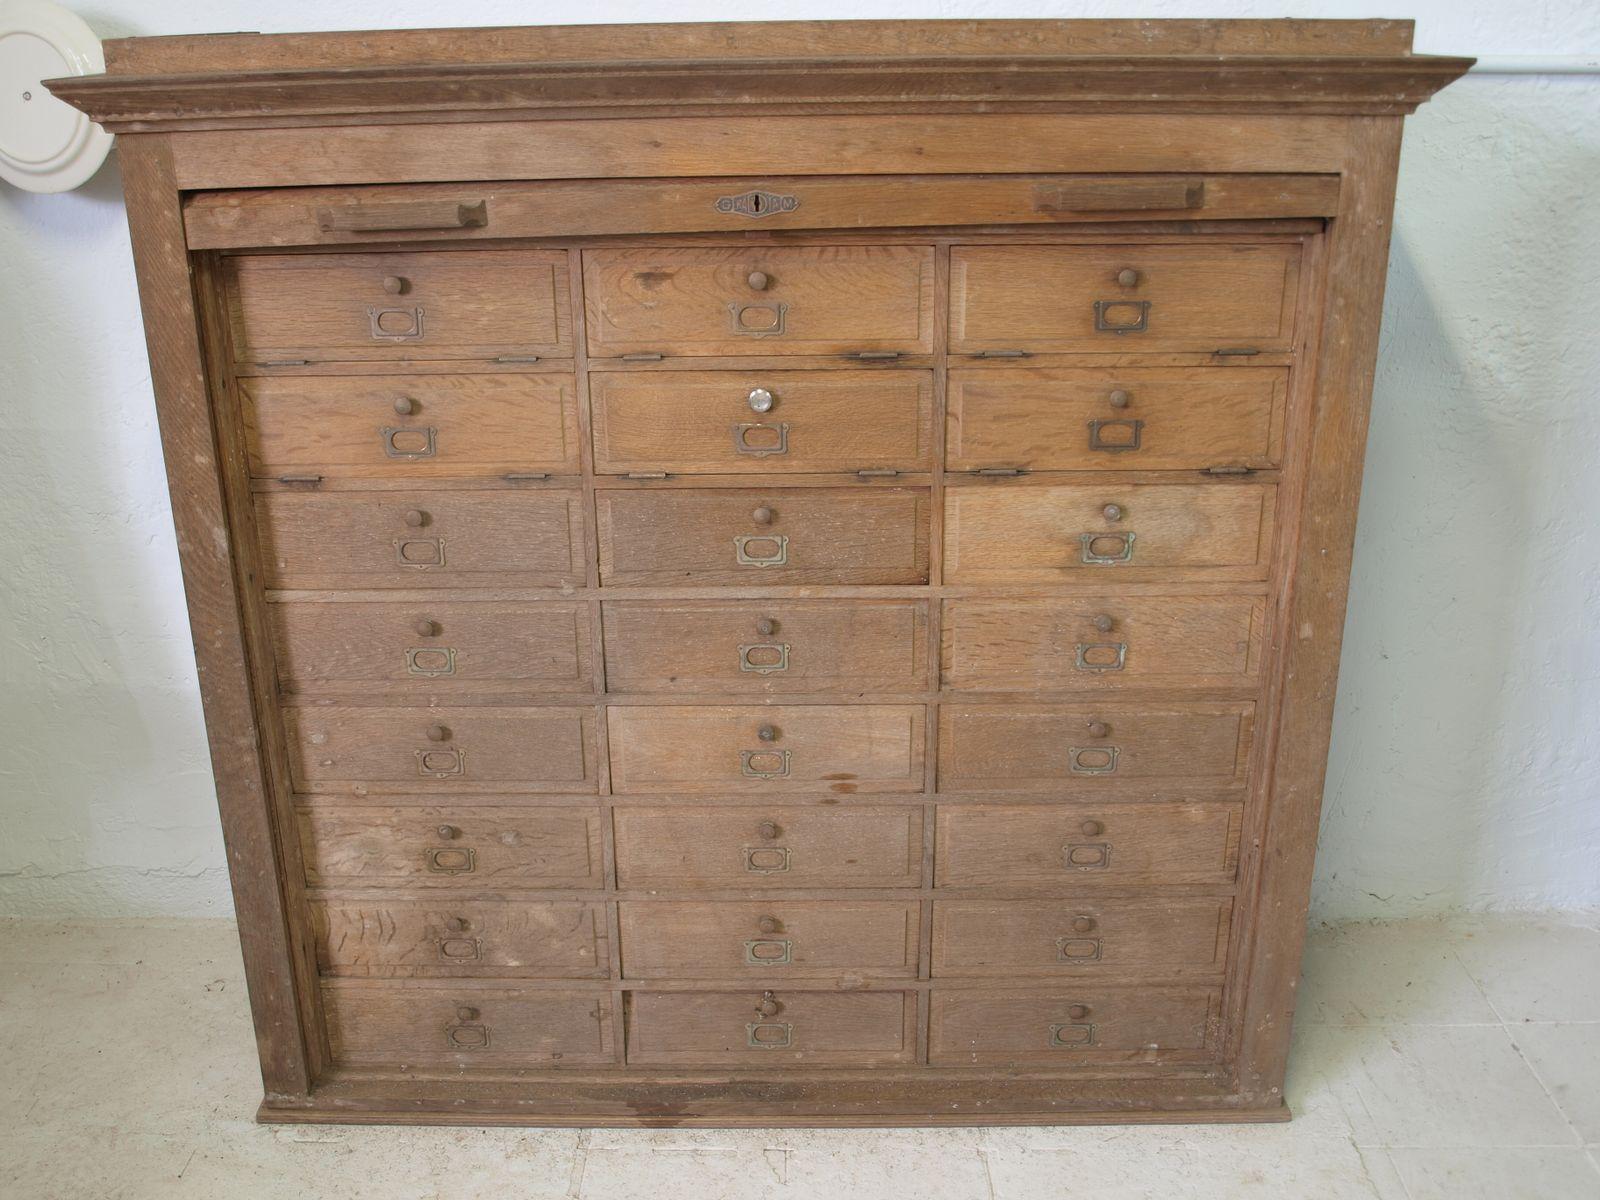 Vintage oak letter cabinet 1940s for sale at pamono for 1940s kitchen cabinets for sale